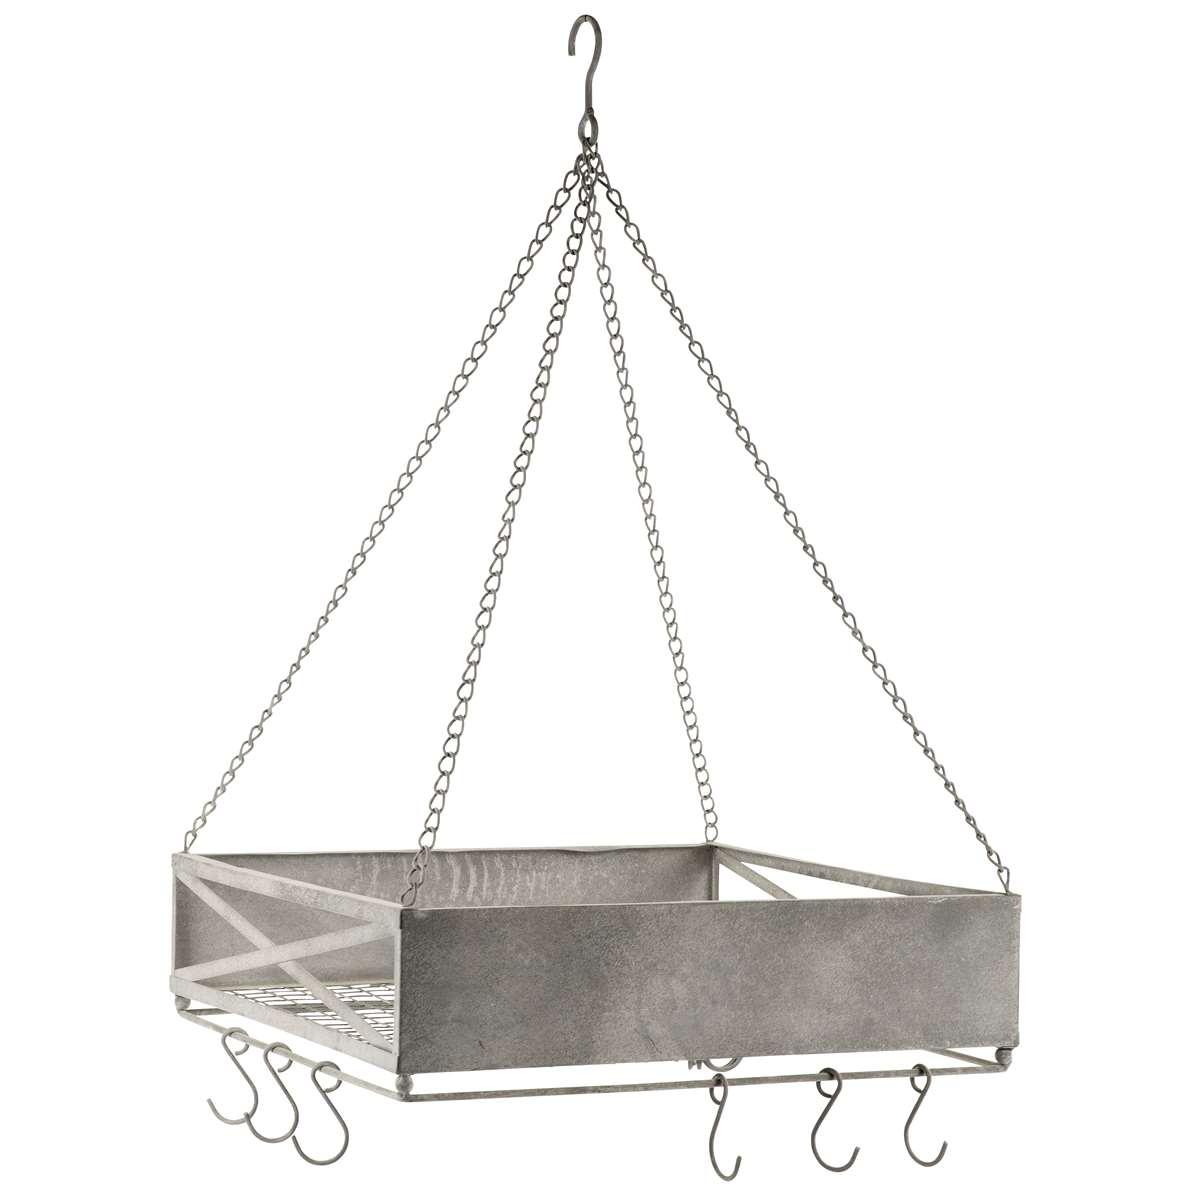 Ful Koksbank : hylla koksbonk  Hongande kokshylla med krokar Zink 40o40 cm